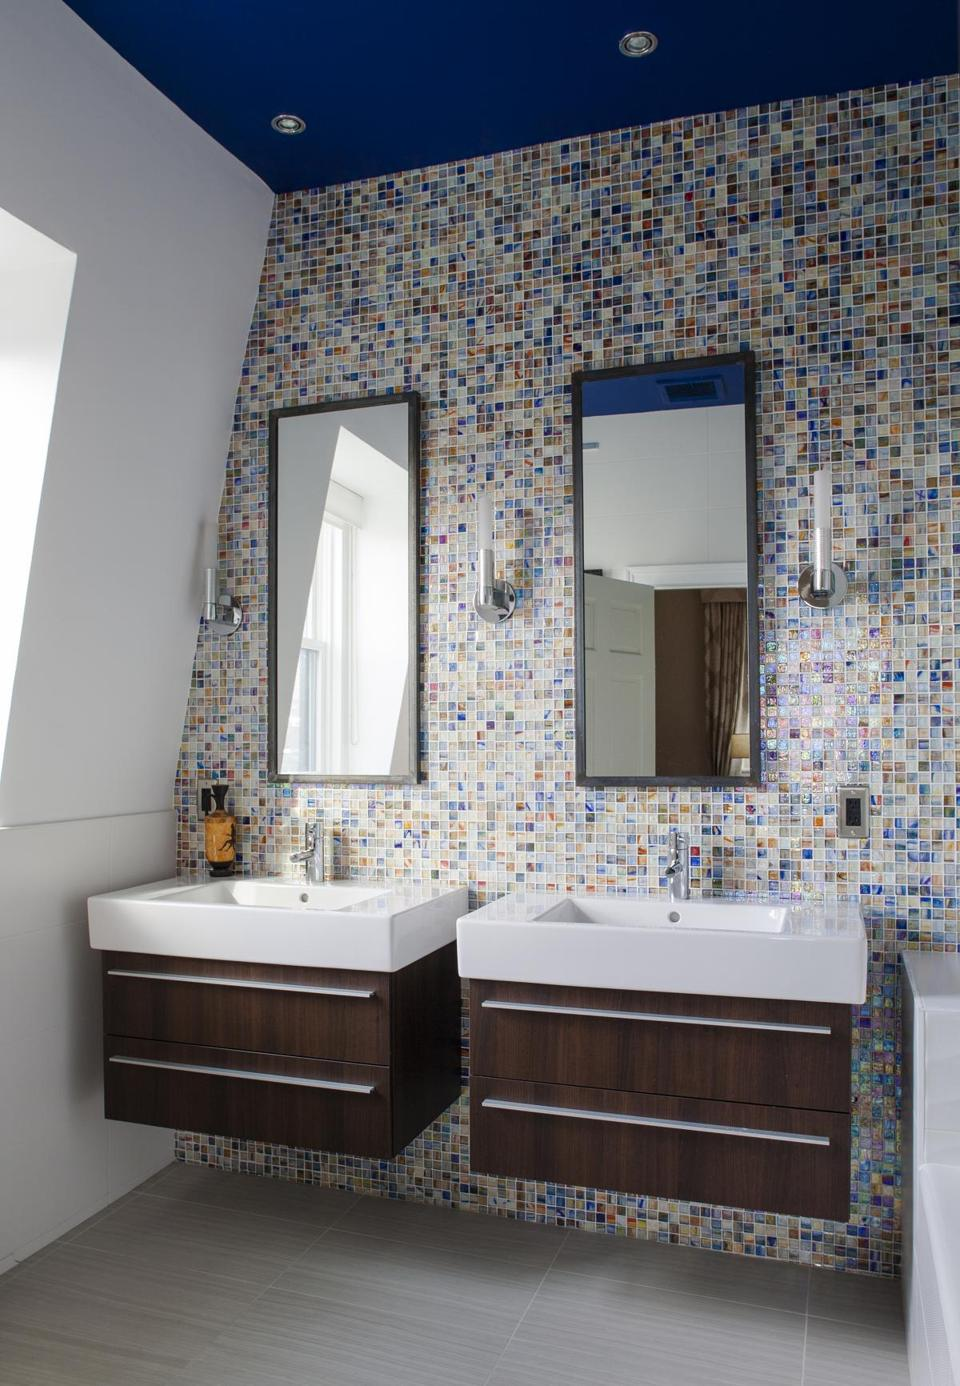 Seven stylish bathroom trends - The Boston Globe on mexican tile bathrooms, marble vanity tops for bathrooms, spanish style bathrooms, mexican home decorations for bathrooms, santa fe style bathrooms, painted mexican bathrooms, colonial style bathrooms, spanish designs for small bathrooms, aztec-inspired bathrooms, mexican looking bathrooms, mixacan bathrooms, shabby chic bathrooms, mediterranean inspired bathrooms, paris inspired bathrooms, spain bathrooms, beach inspired bathrooms, asian-inspired bathrooms,